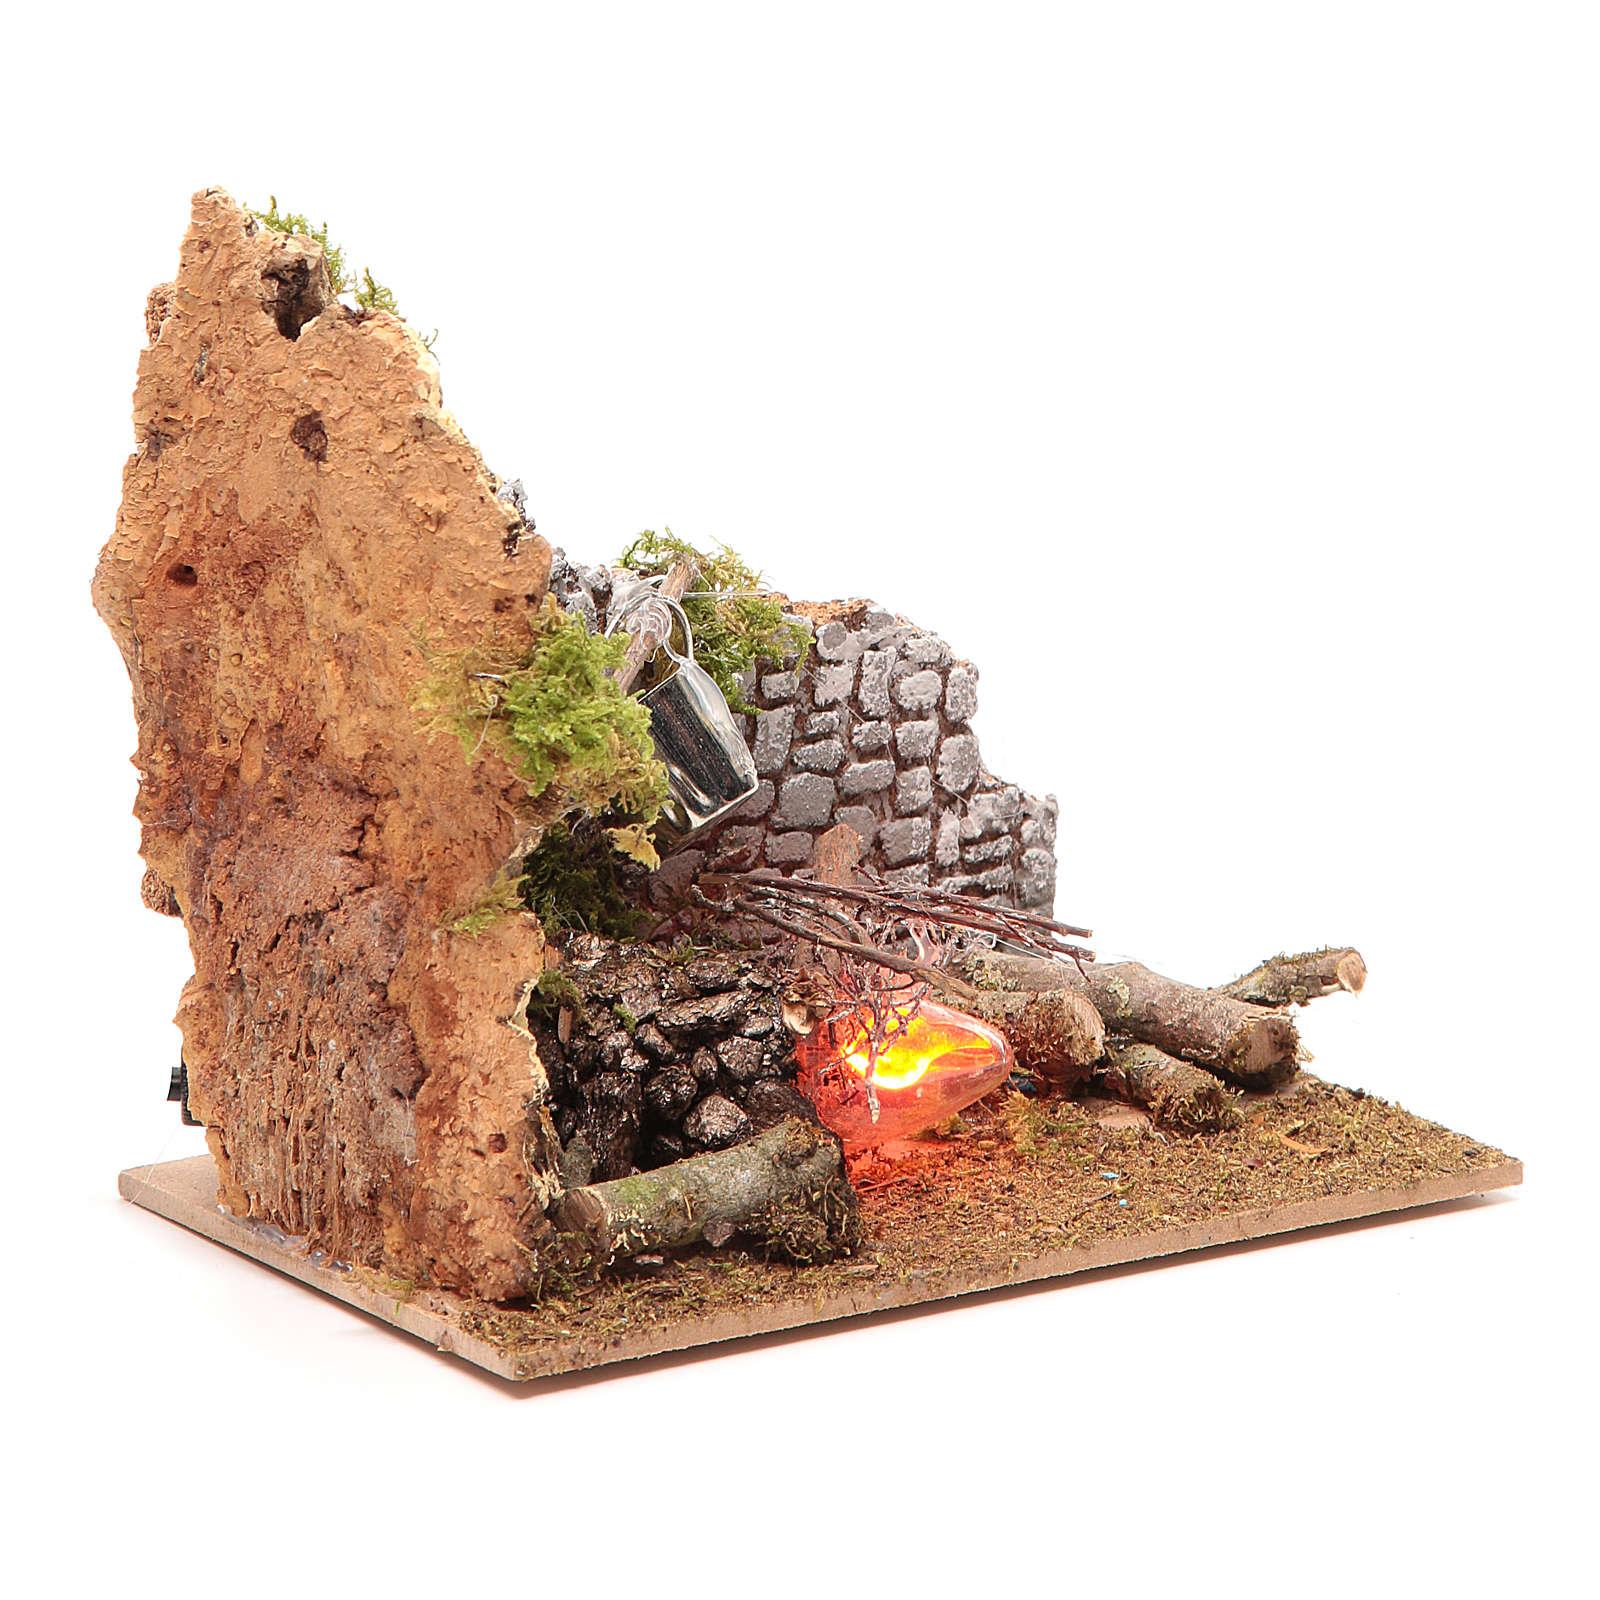 Electric fire 15x15x10 cm 4